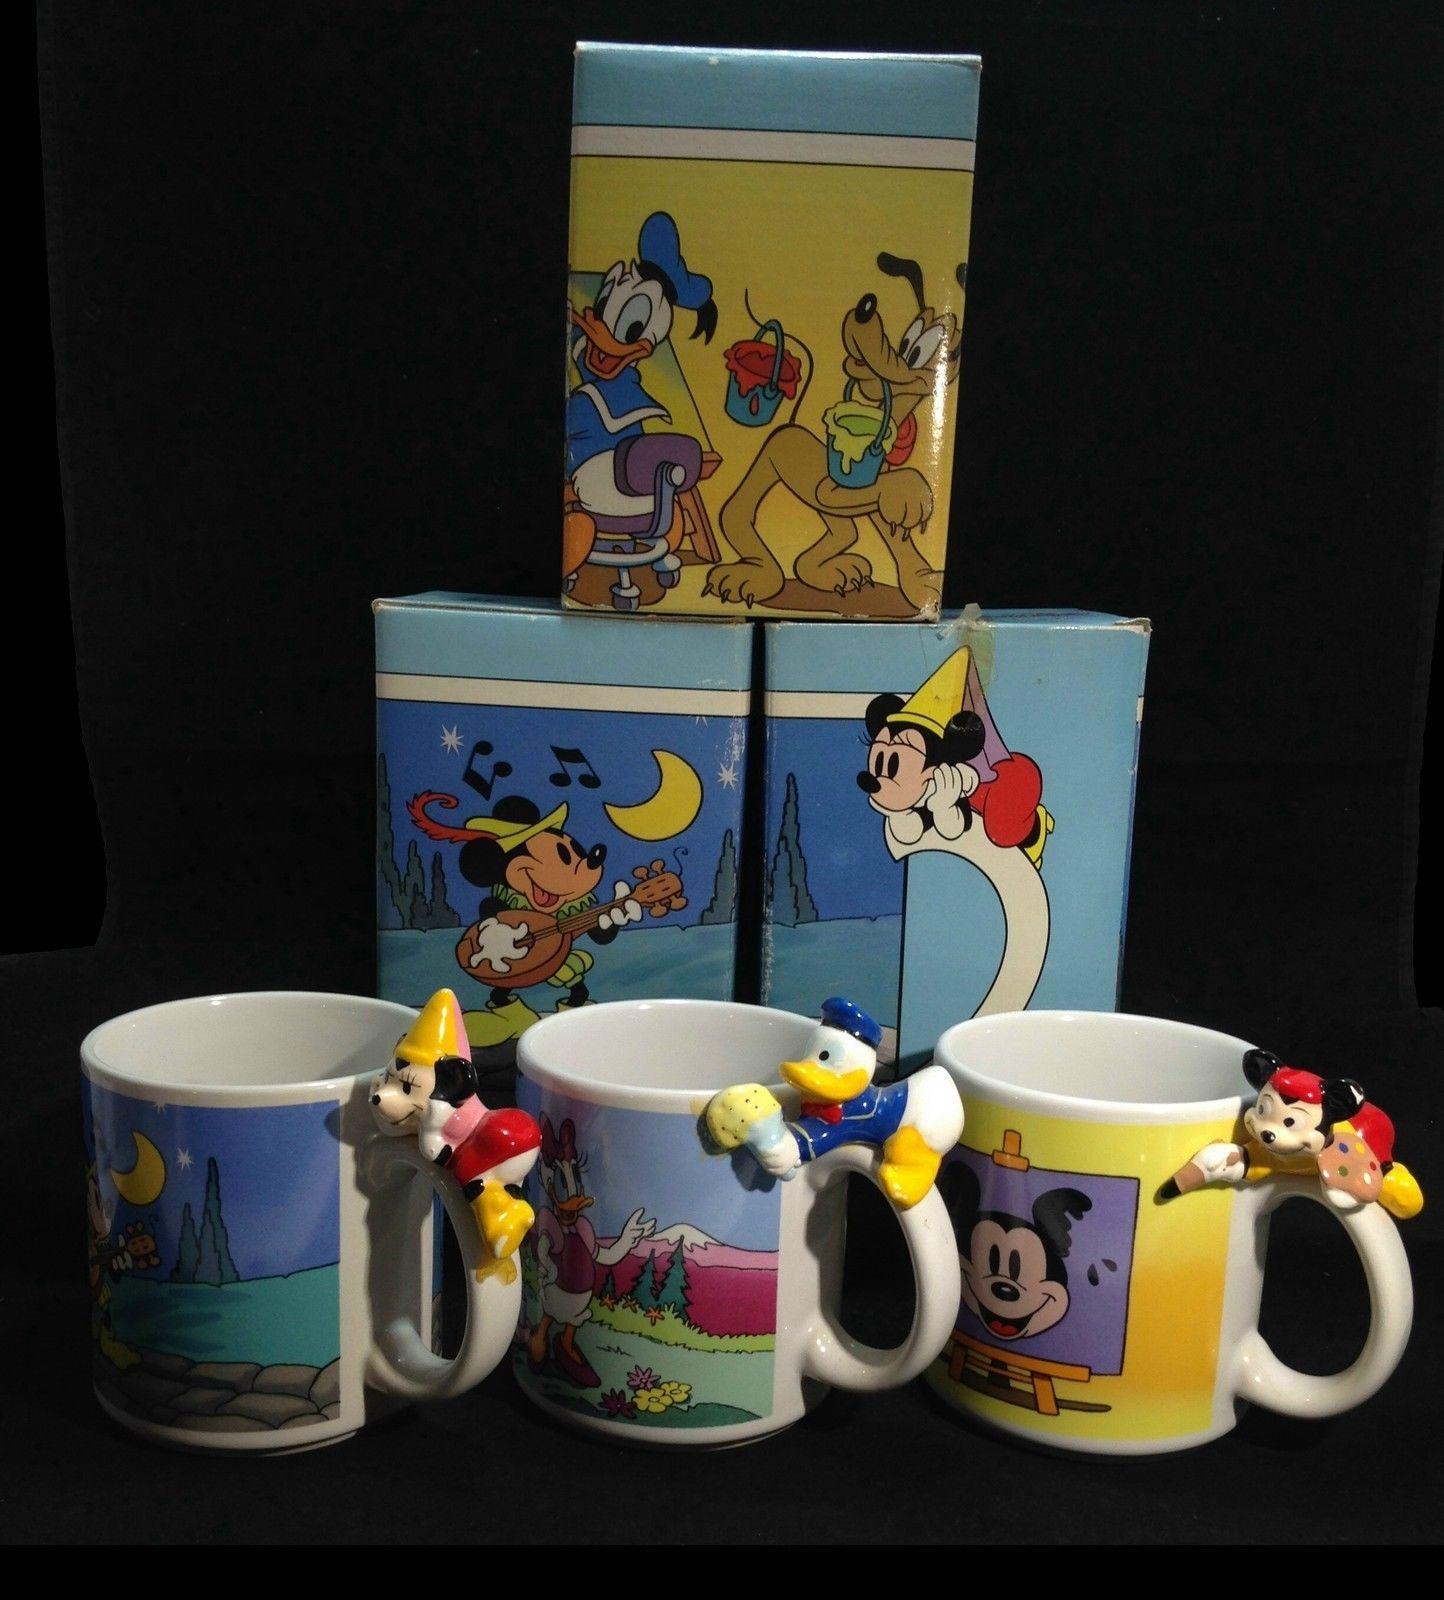 Disney MICKEY, MINNIE, Daffy Figural Cups w/Box Ceramic Set of 3 by Applause - $41.95